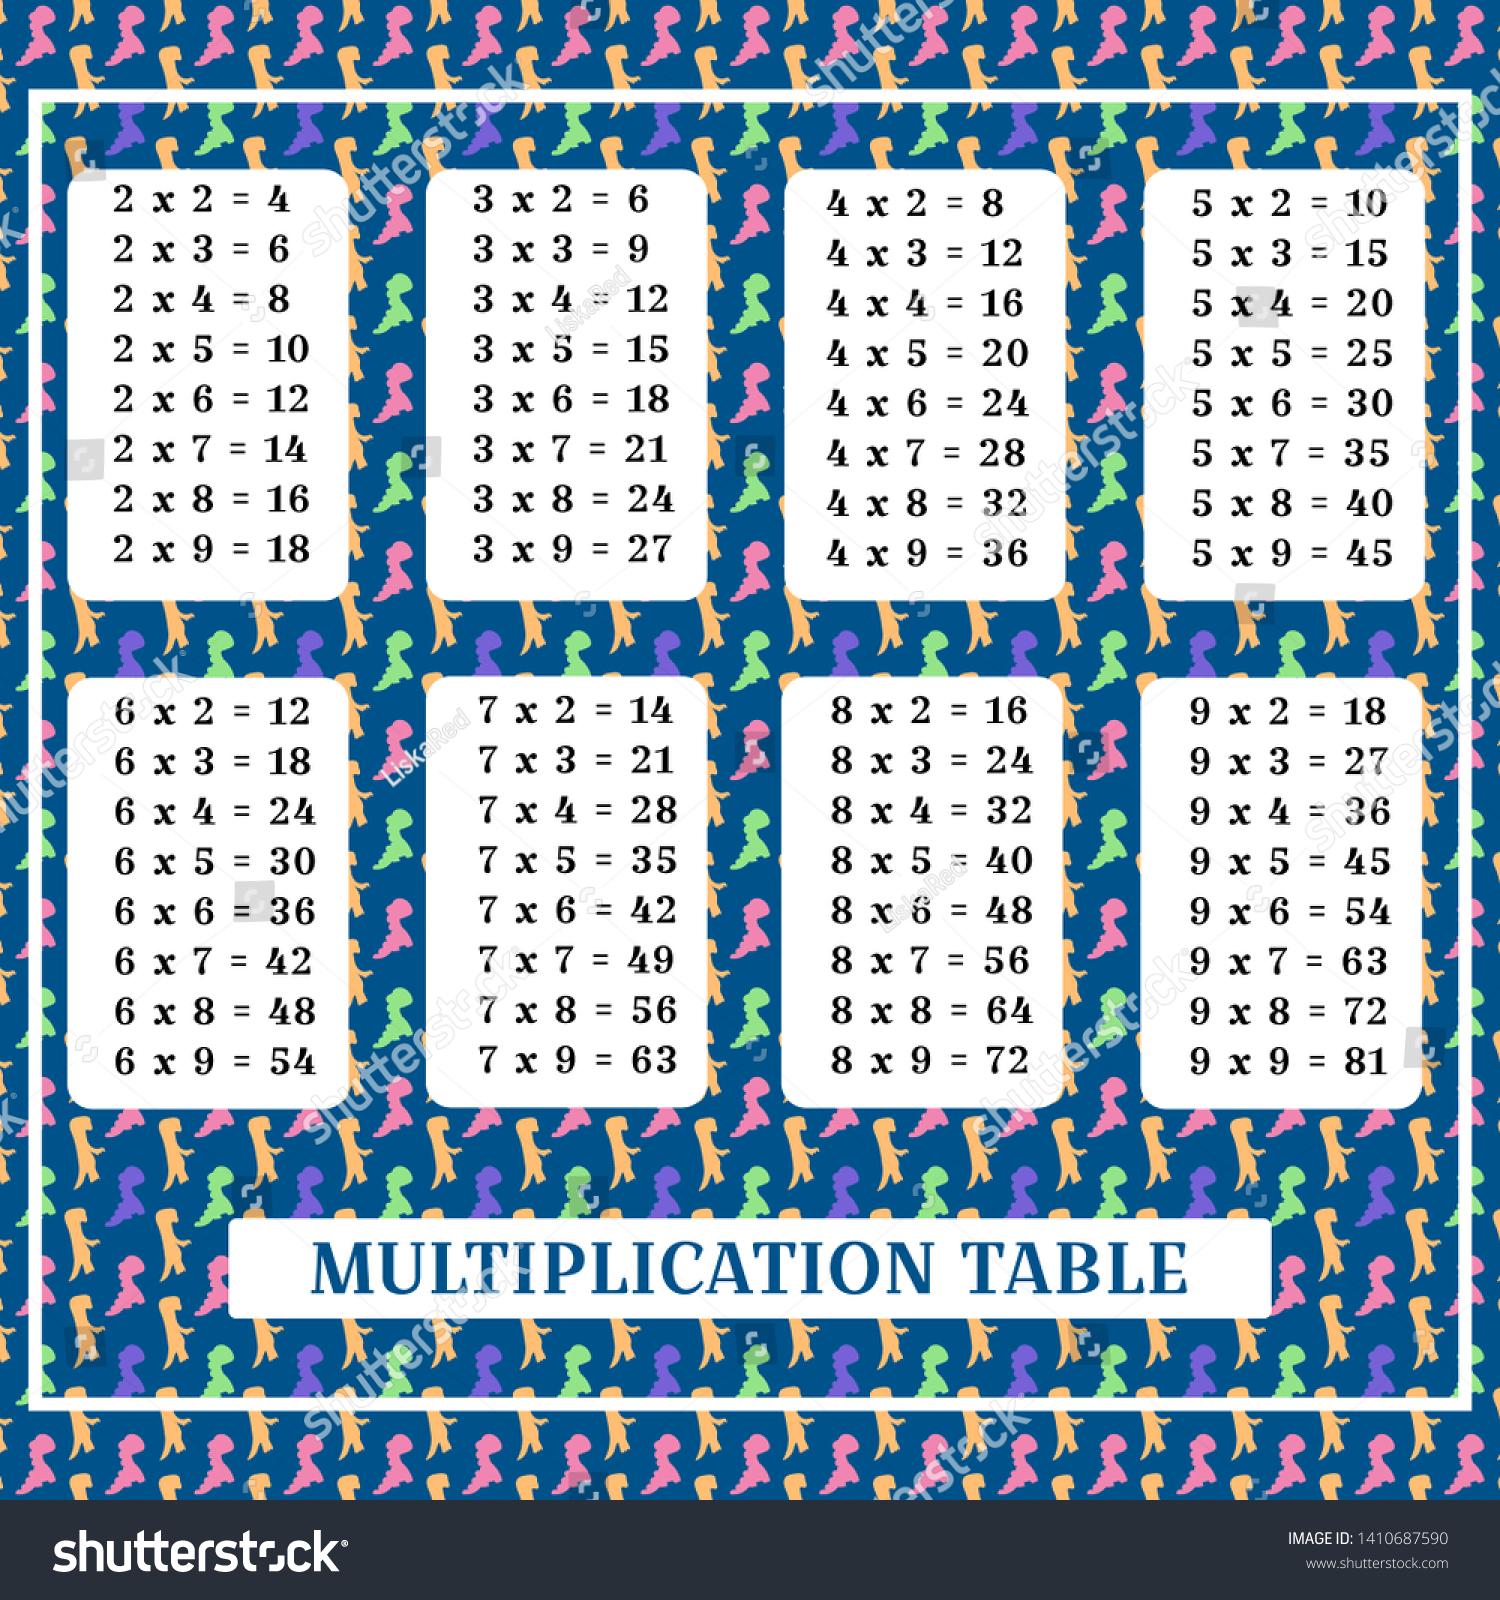 Square Card Multiplication Table Desktop Poster Stock Vector